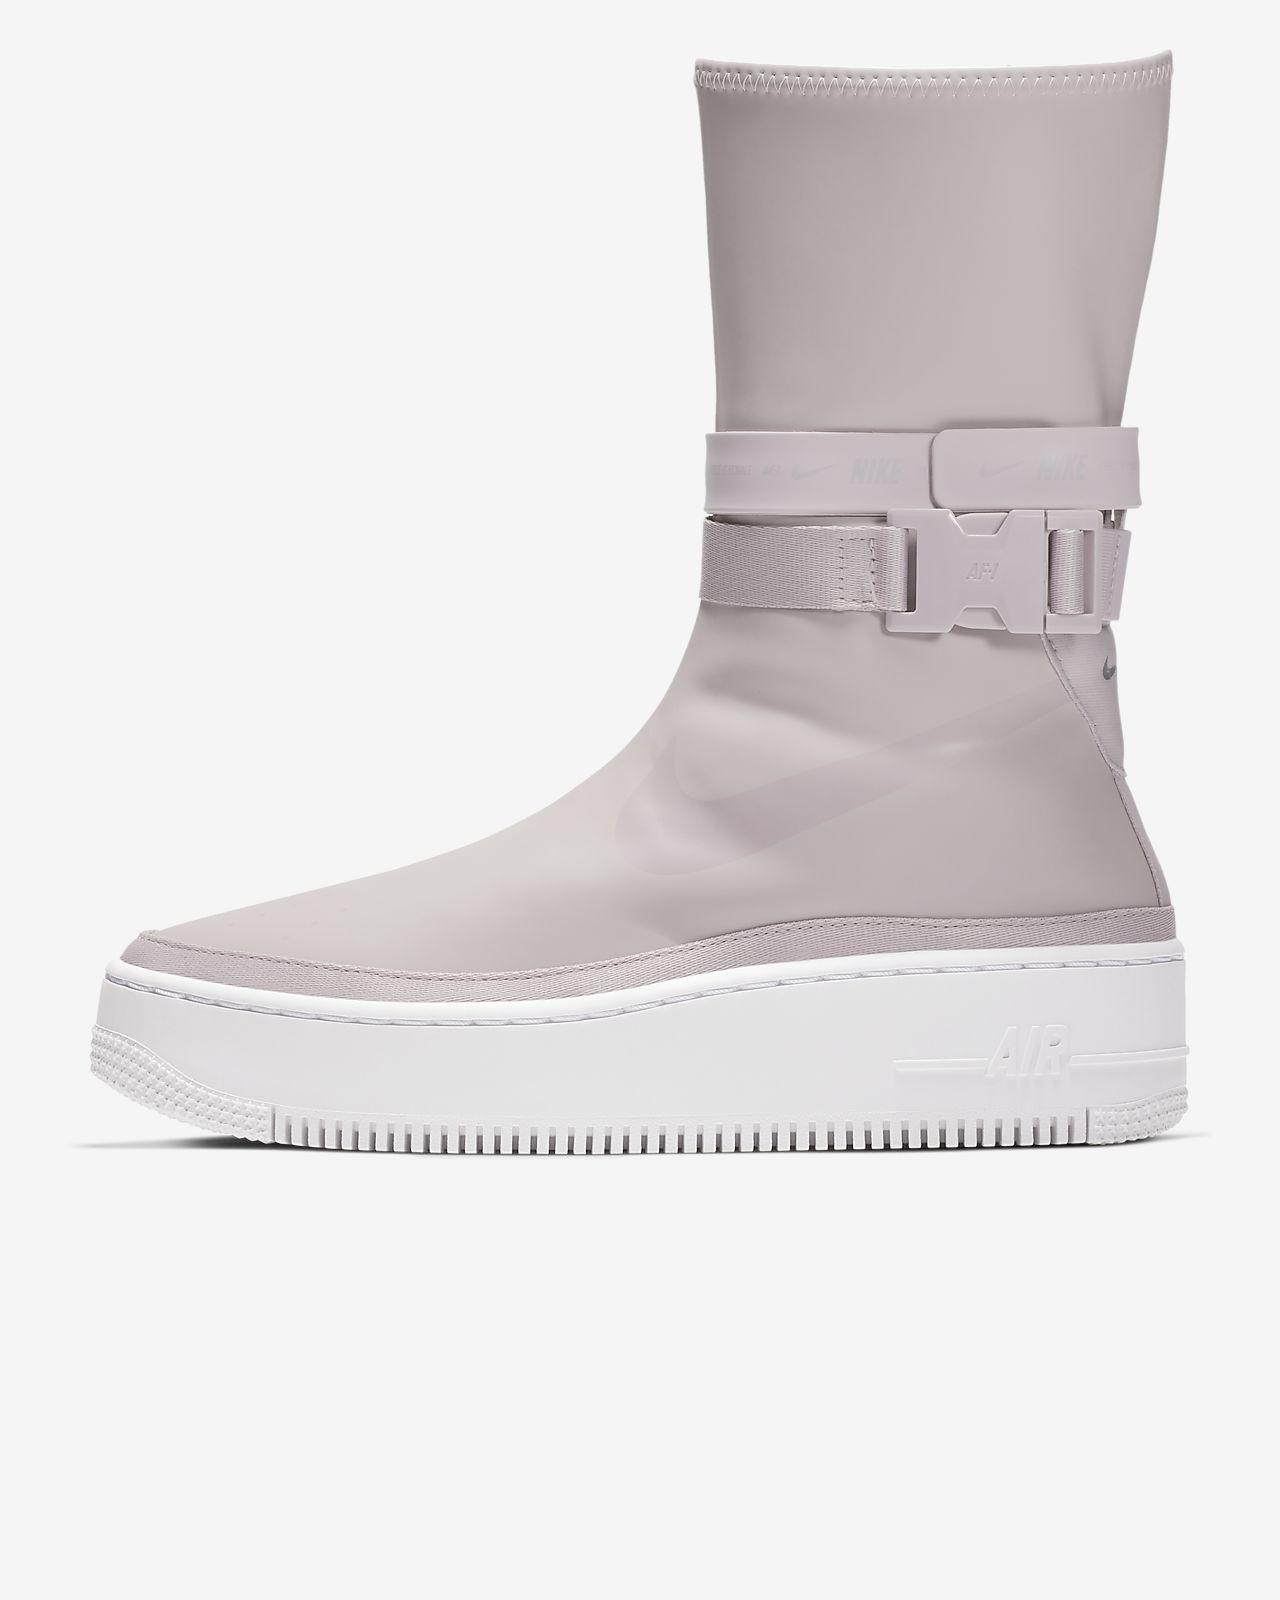 separation shoes 0f95d e5b13 Nike Air Force 1 Sage High Damesschoen